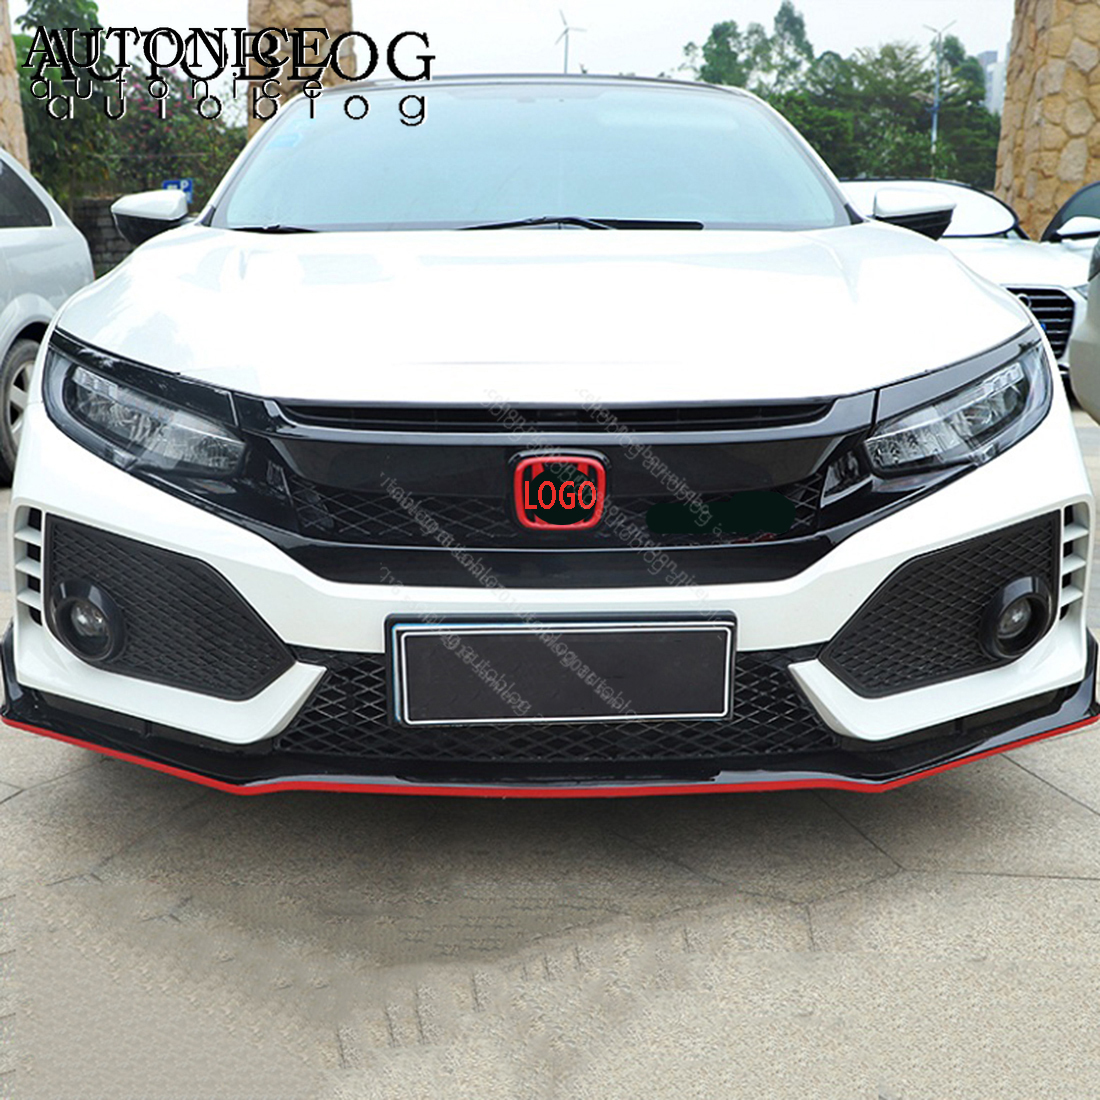 Pre-cut vehicle graphic overlays Toyota Yaris sedan White headlight eyelids